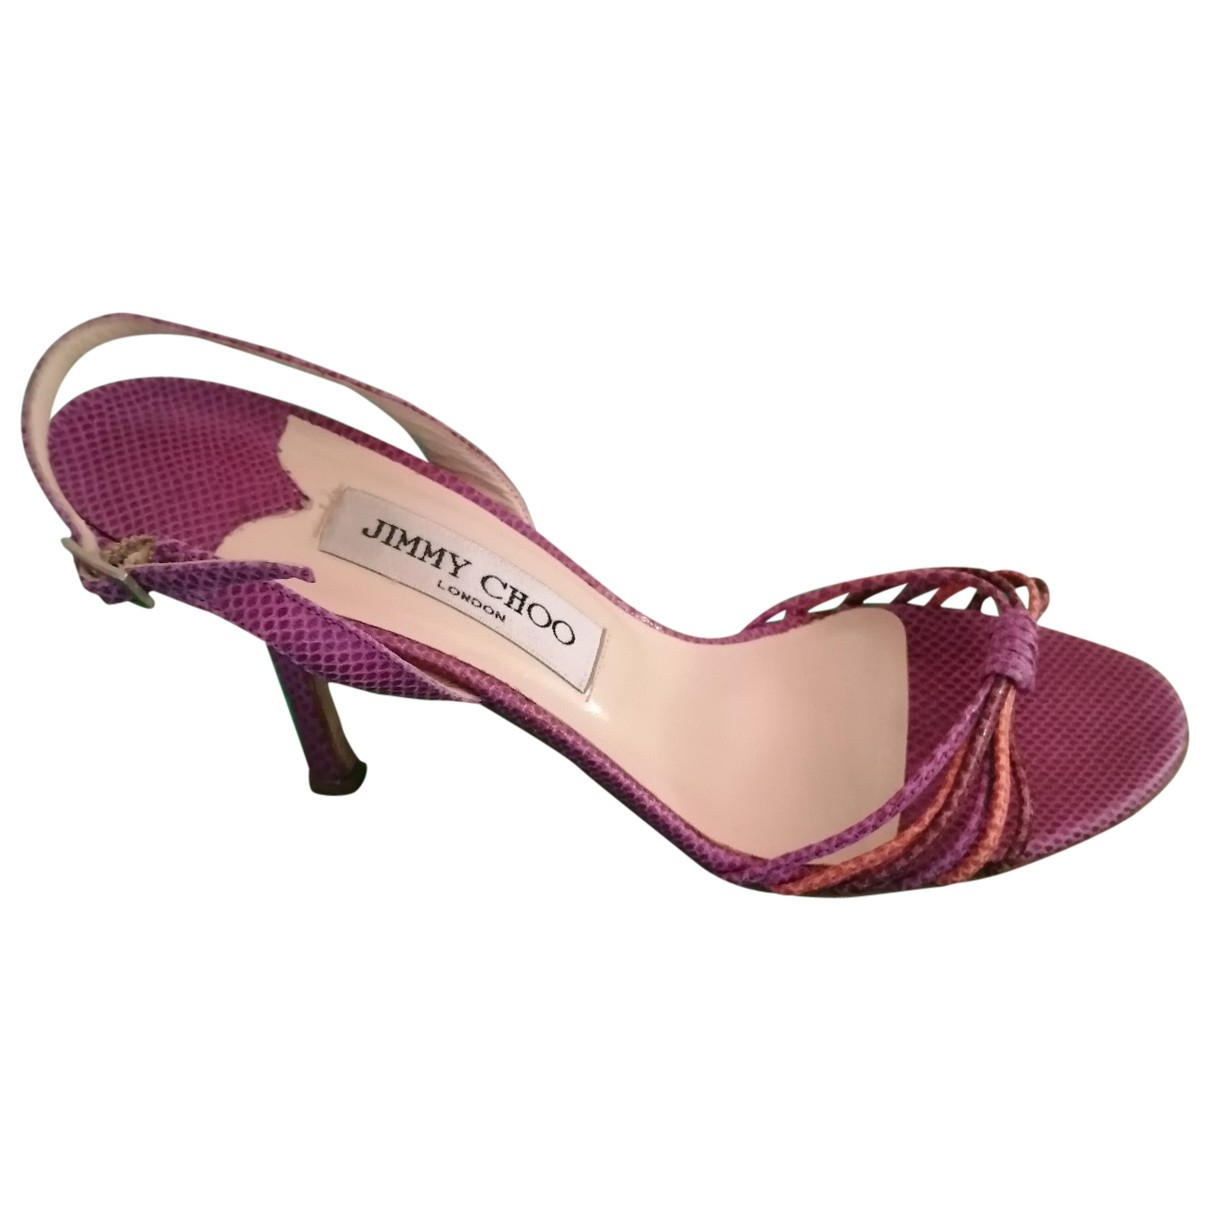 Jimmy Choo - Sandales   pour femme en cuir - violet